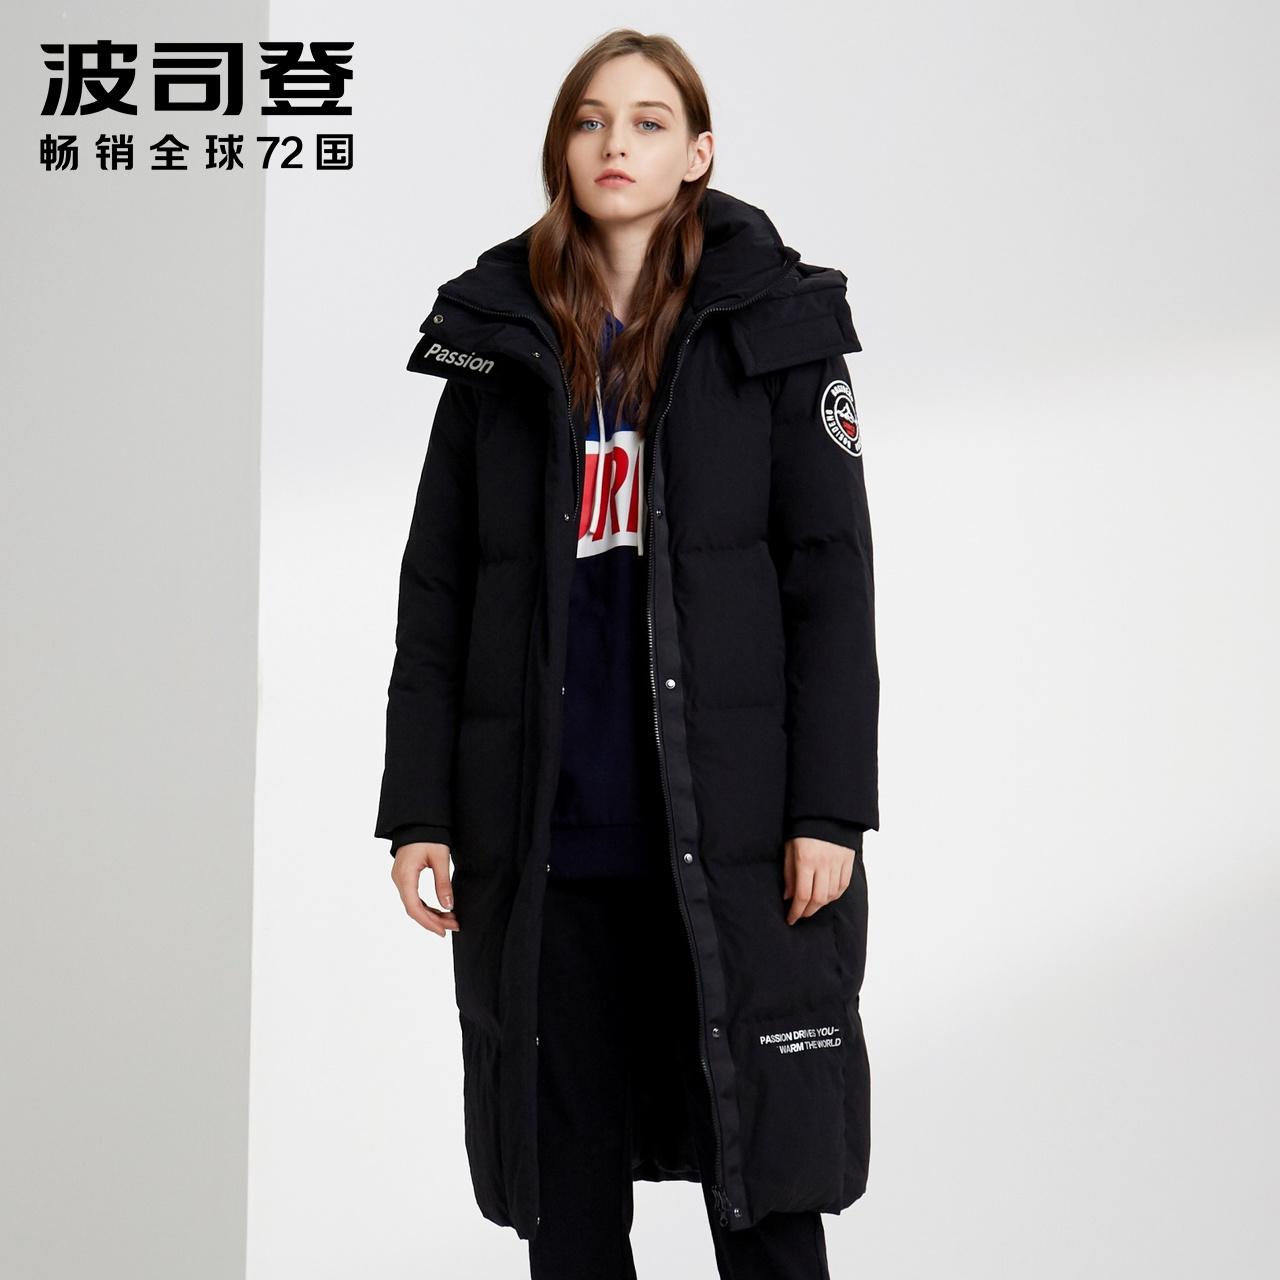 B90142306L 2019  波司登女羽绒服可脱卸帽长款 新款时尚厚款保暖外套